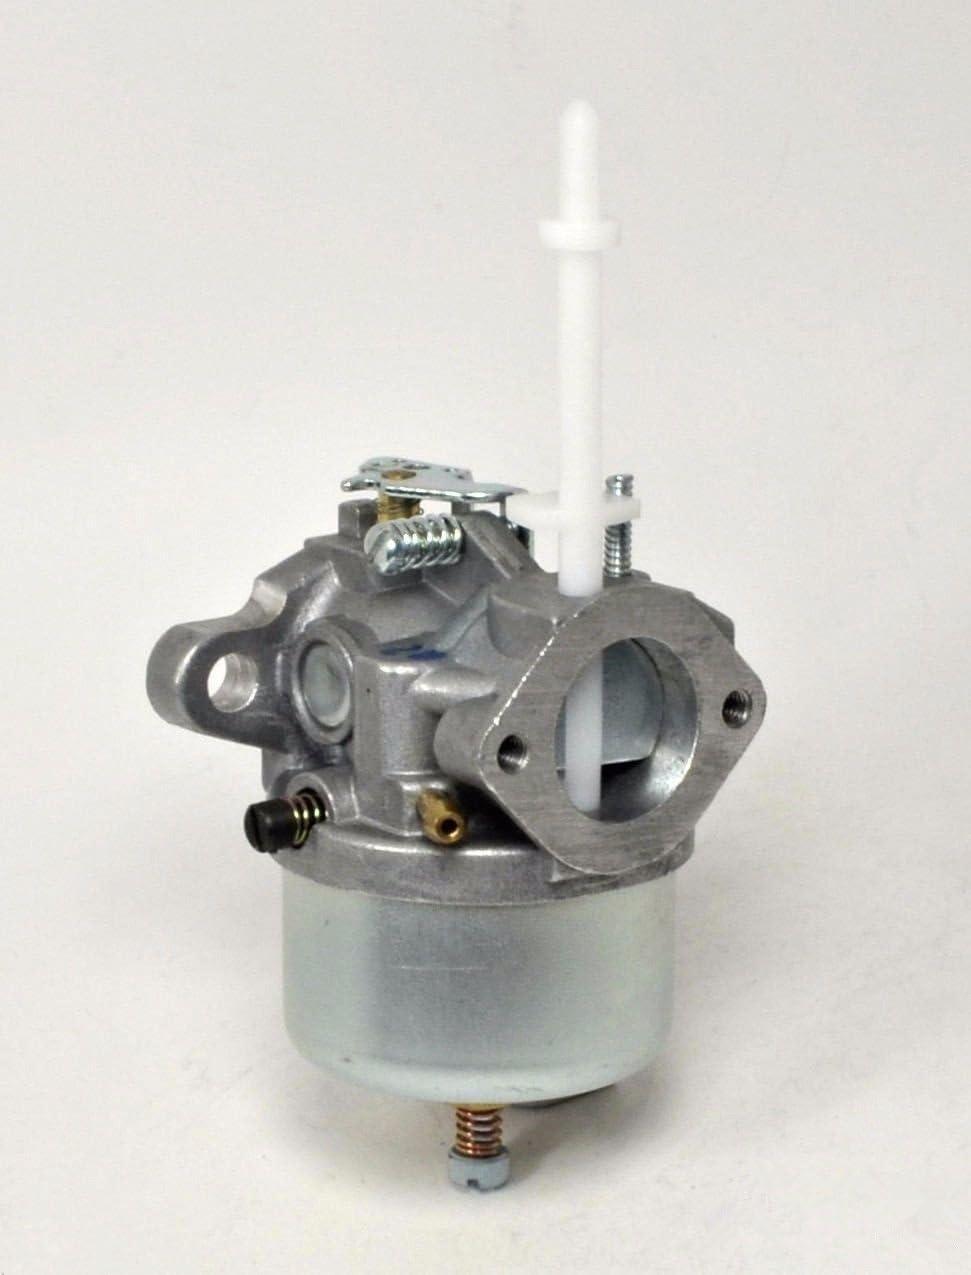 New CARBURETOR fits TECUMSEH 7hp Snowking Engine 631954 H70 HSK70 Ariens Toro